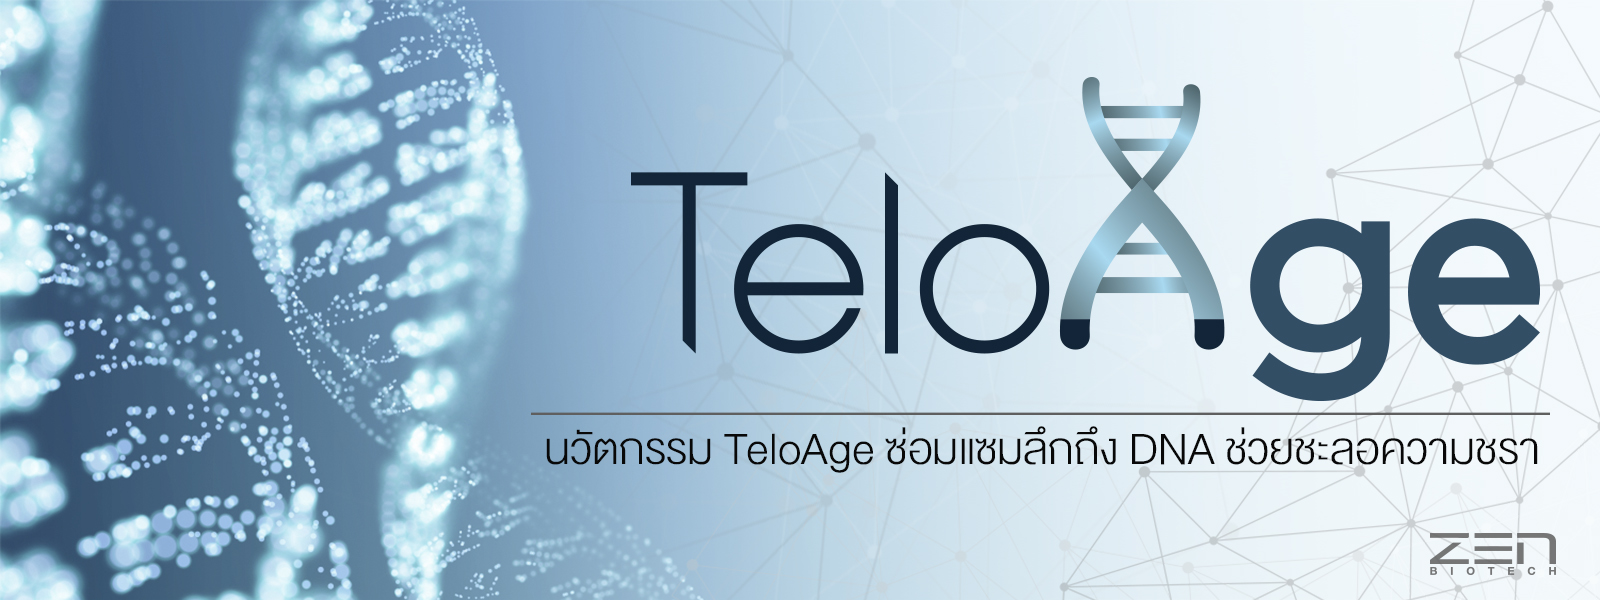 Teloage